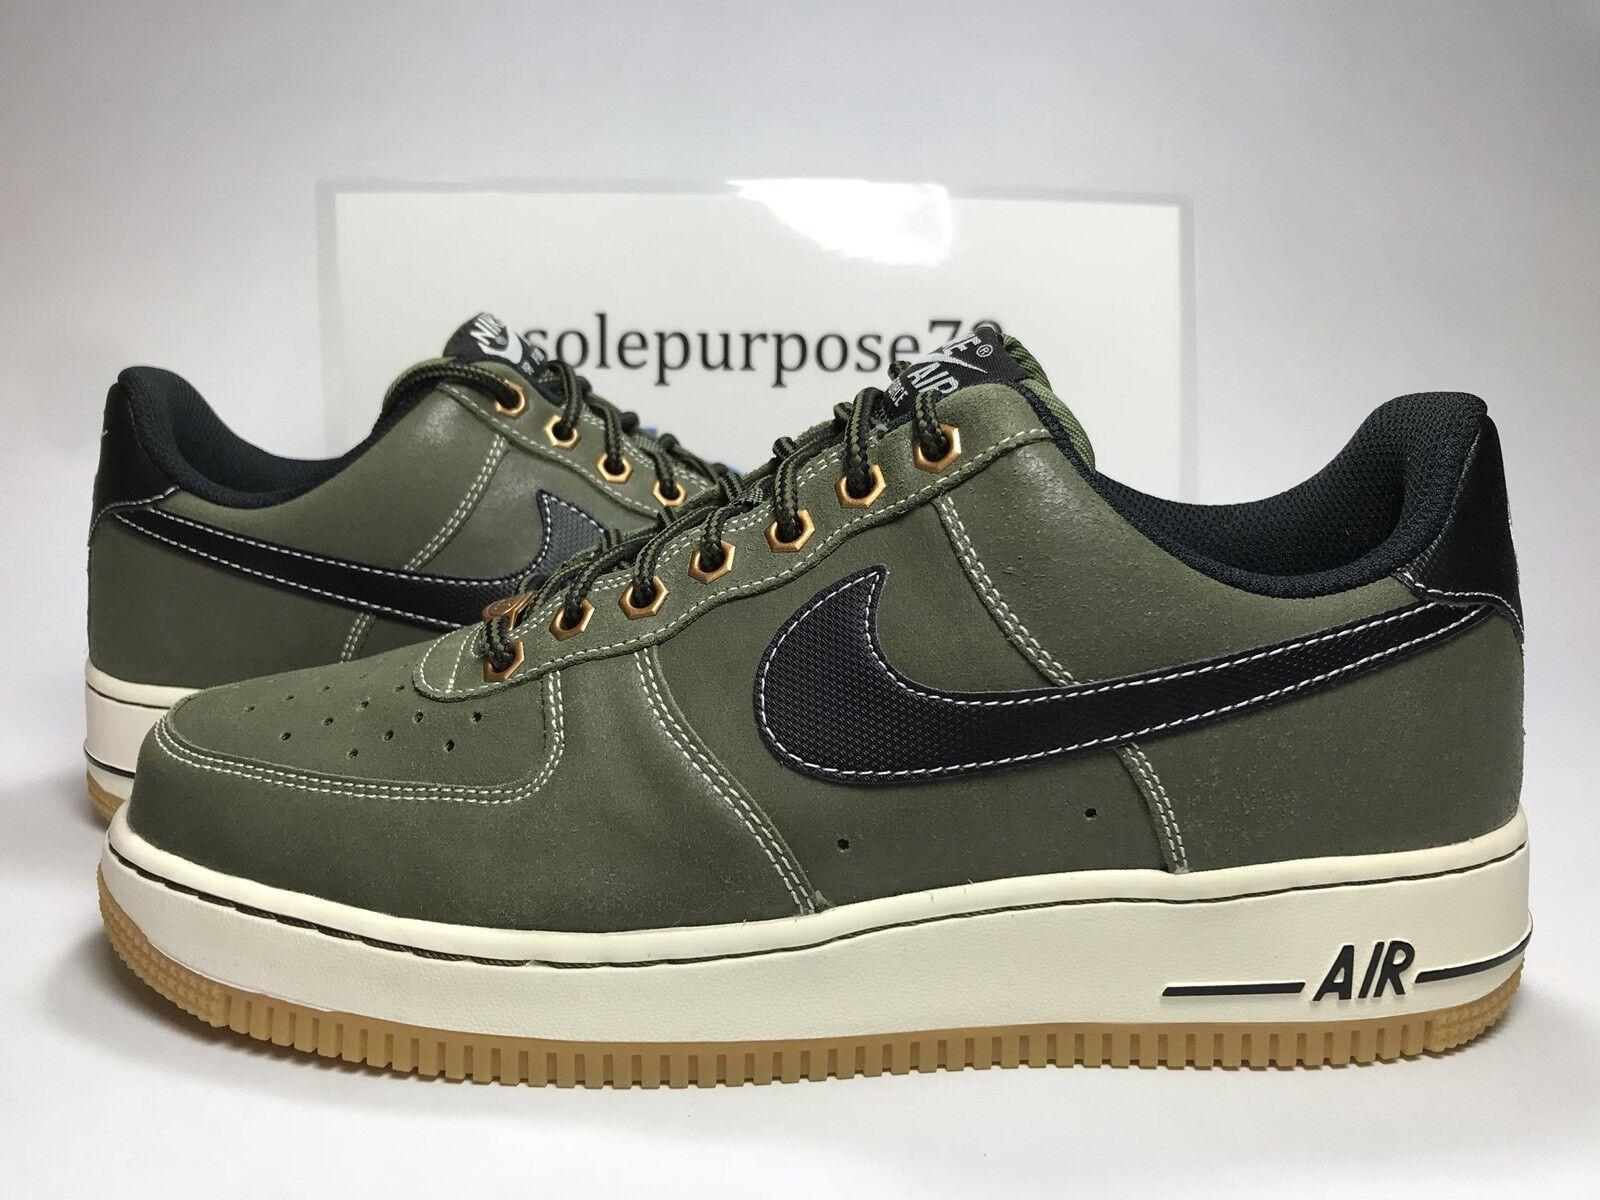 Nike Air Force 1 Medium Olive size 7.5 New